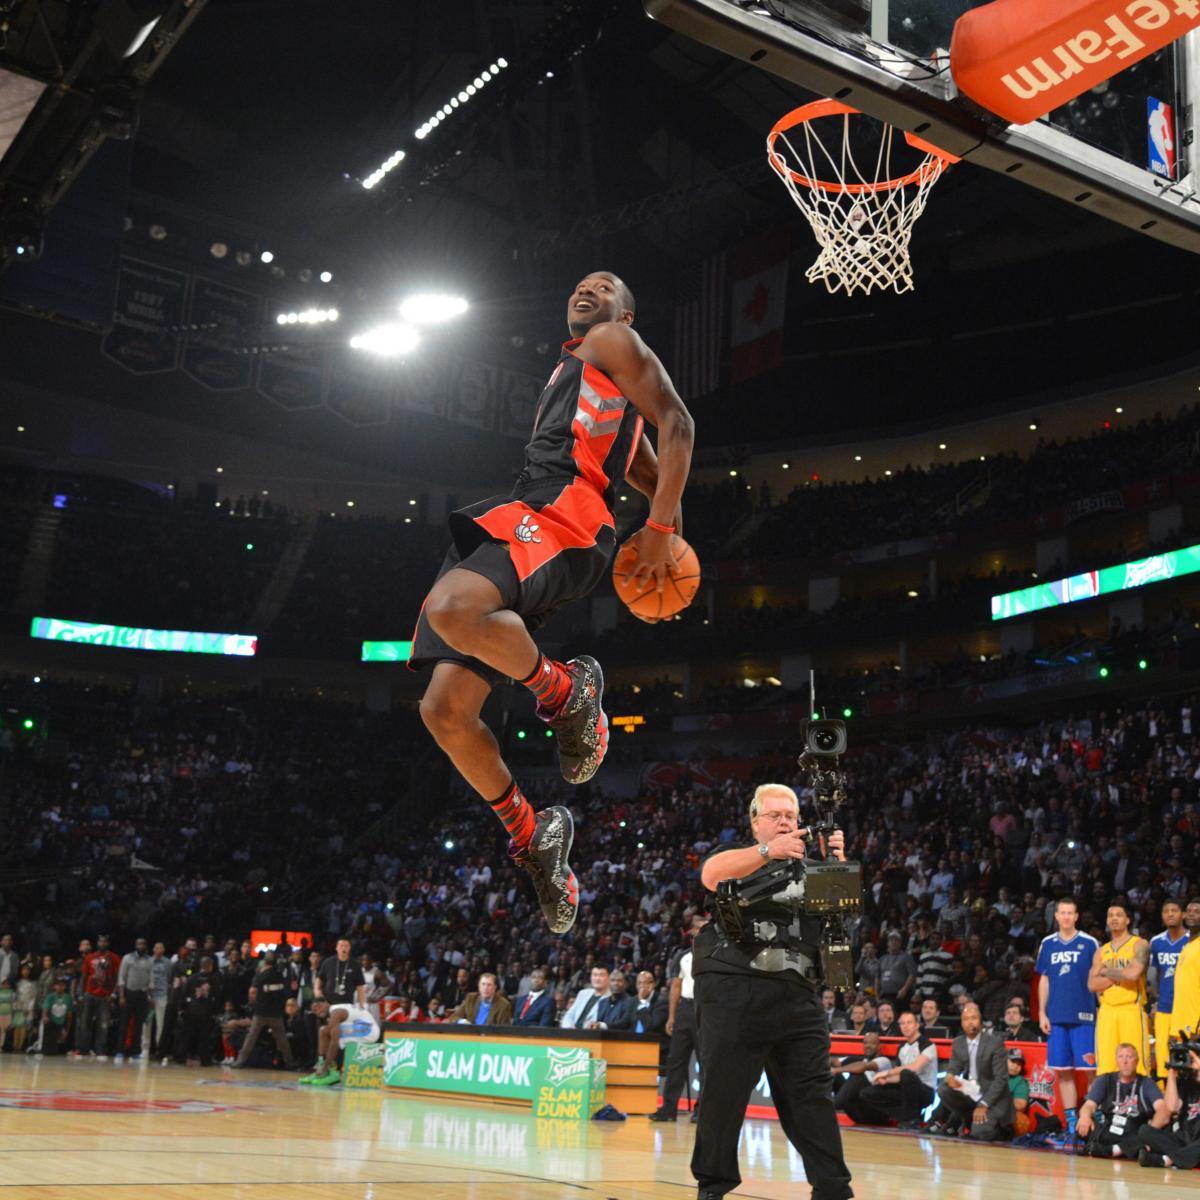 NBA Slam Dunk Contest 2014: Predicting Who Will Pull Off